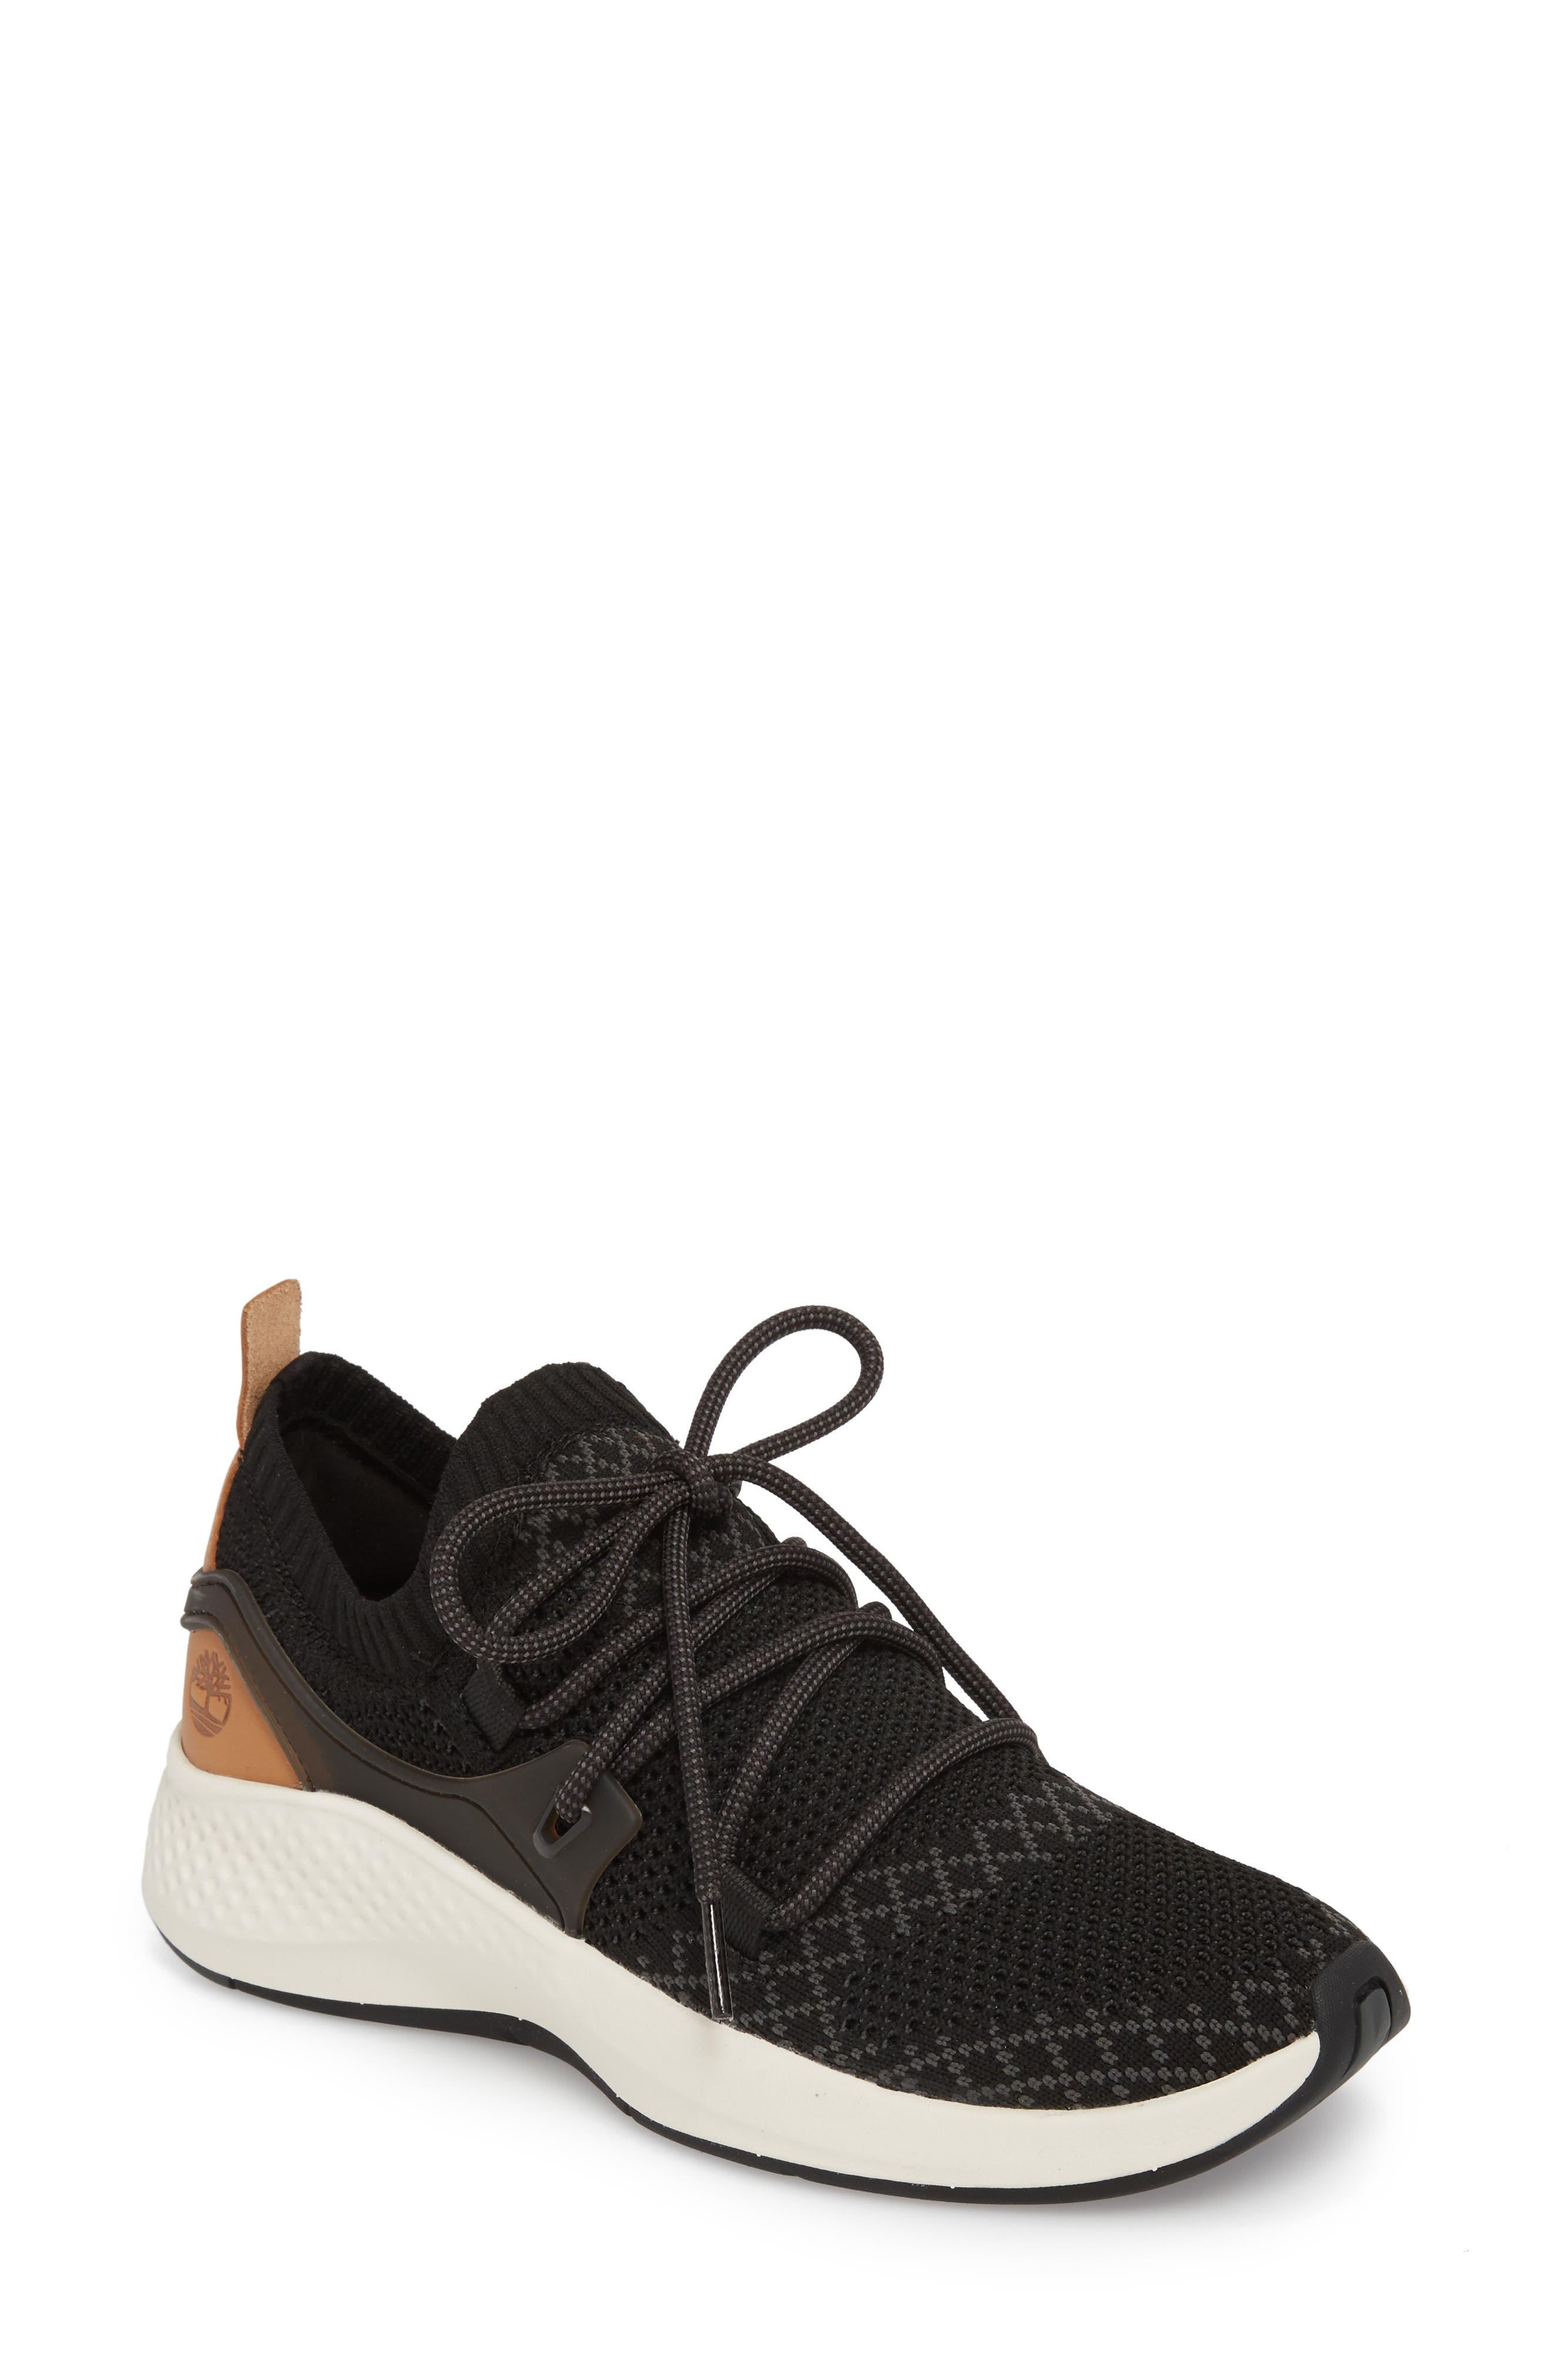 FlyRoam Go Knit Sneaker,                             Main thumbnail 1, color,                             Black Fabric